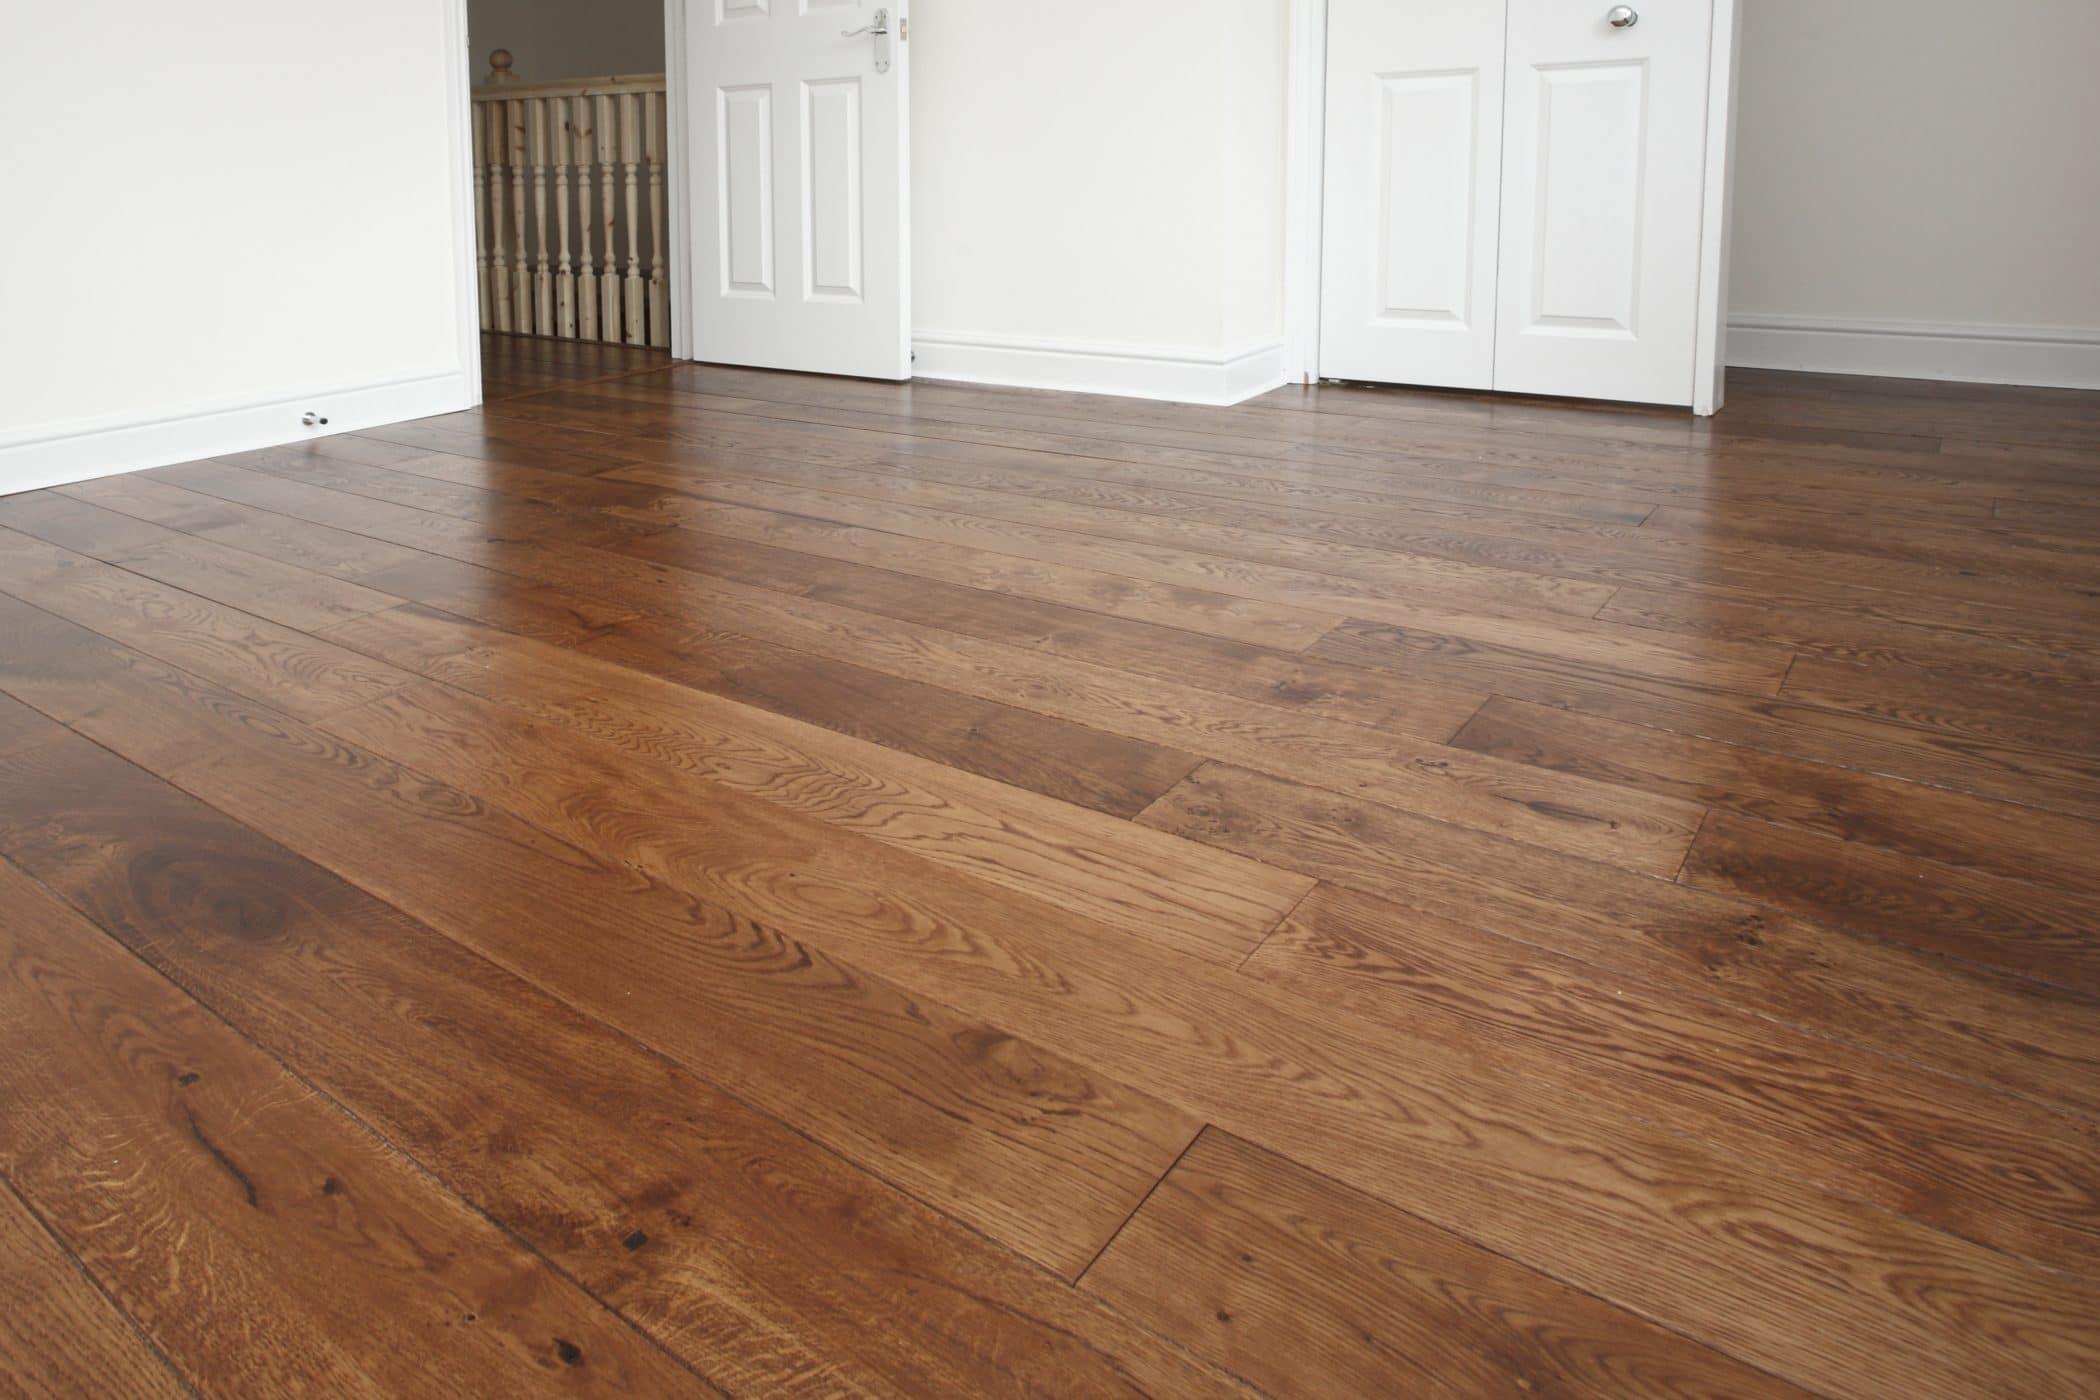 _MG_3715  UK Wood Floors  Bespoke Joinery